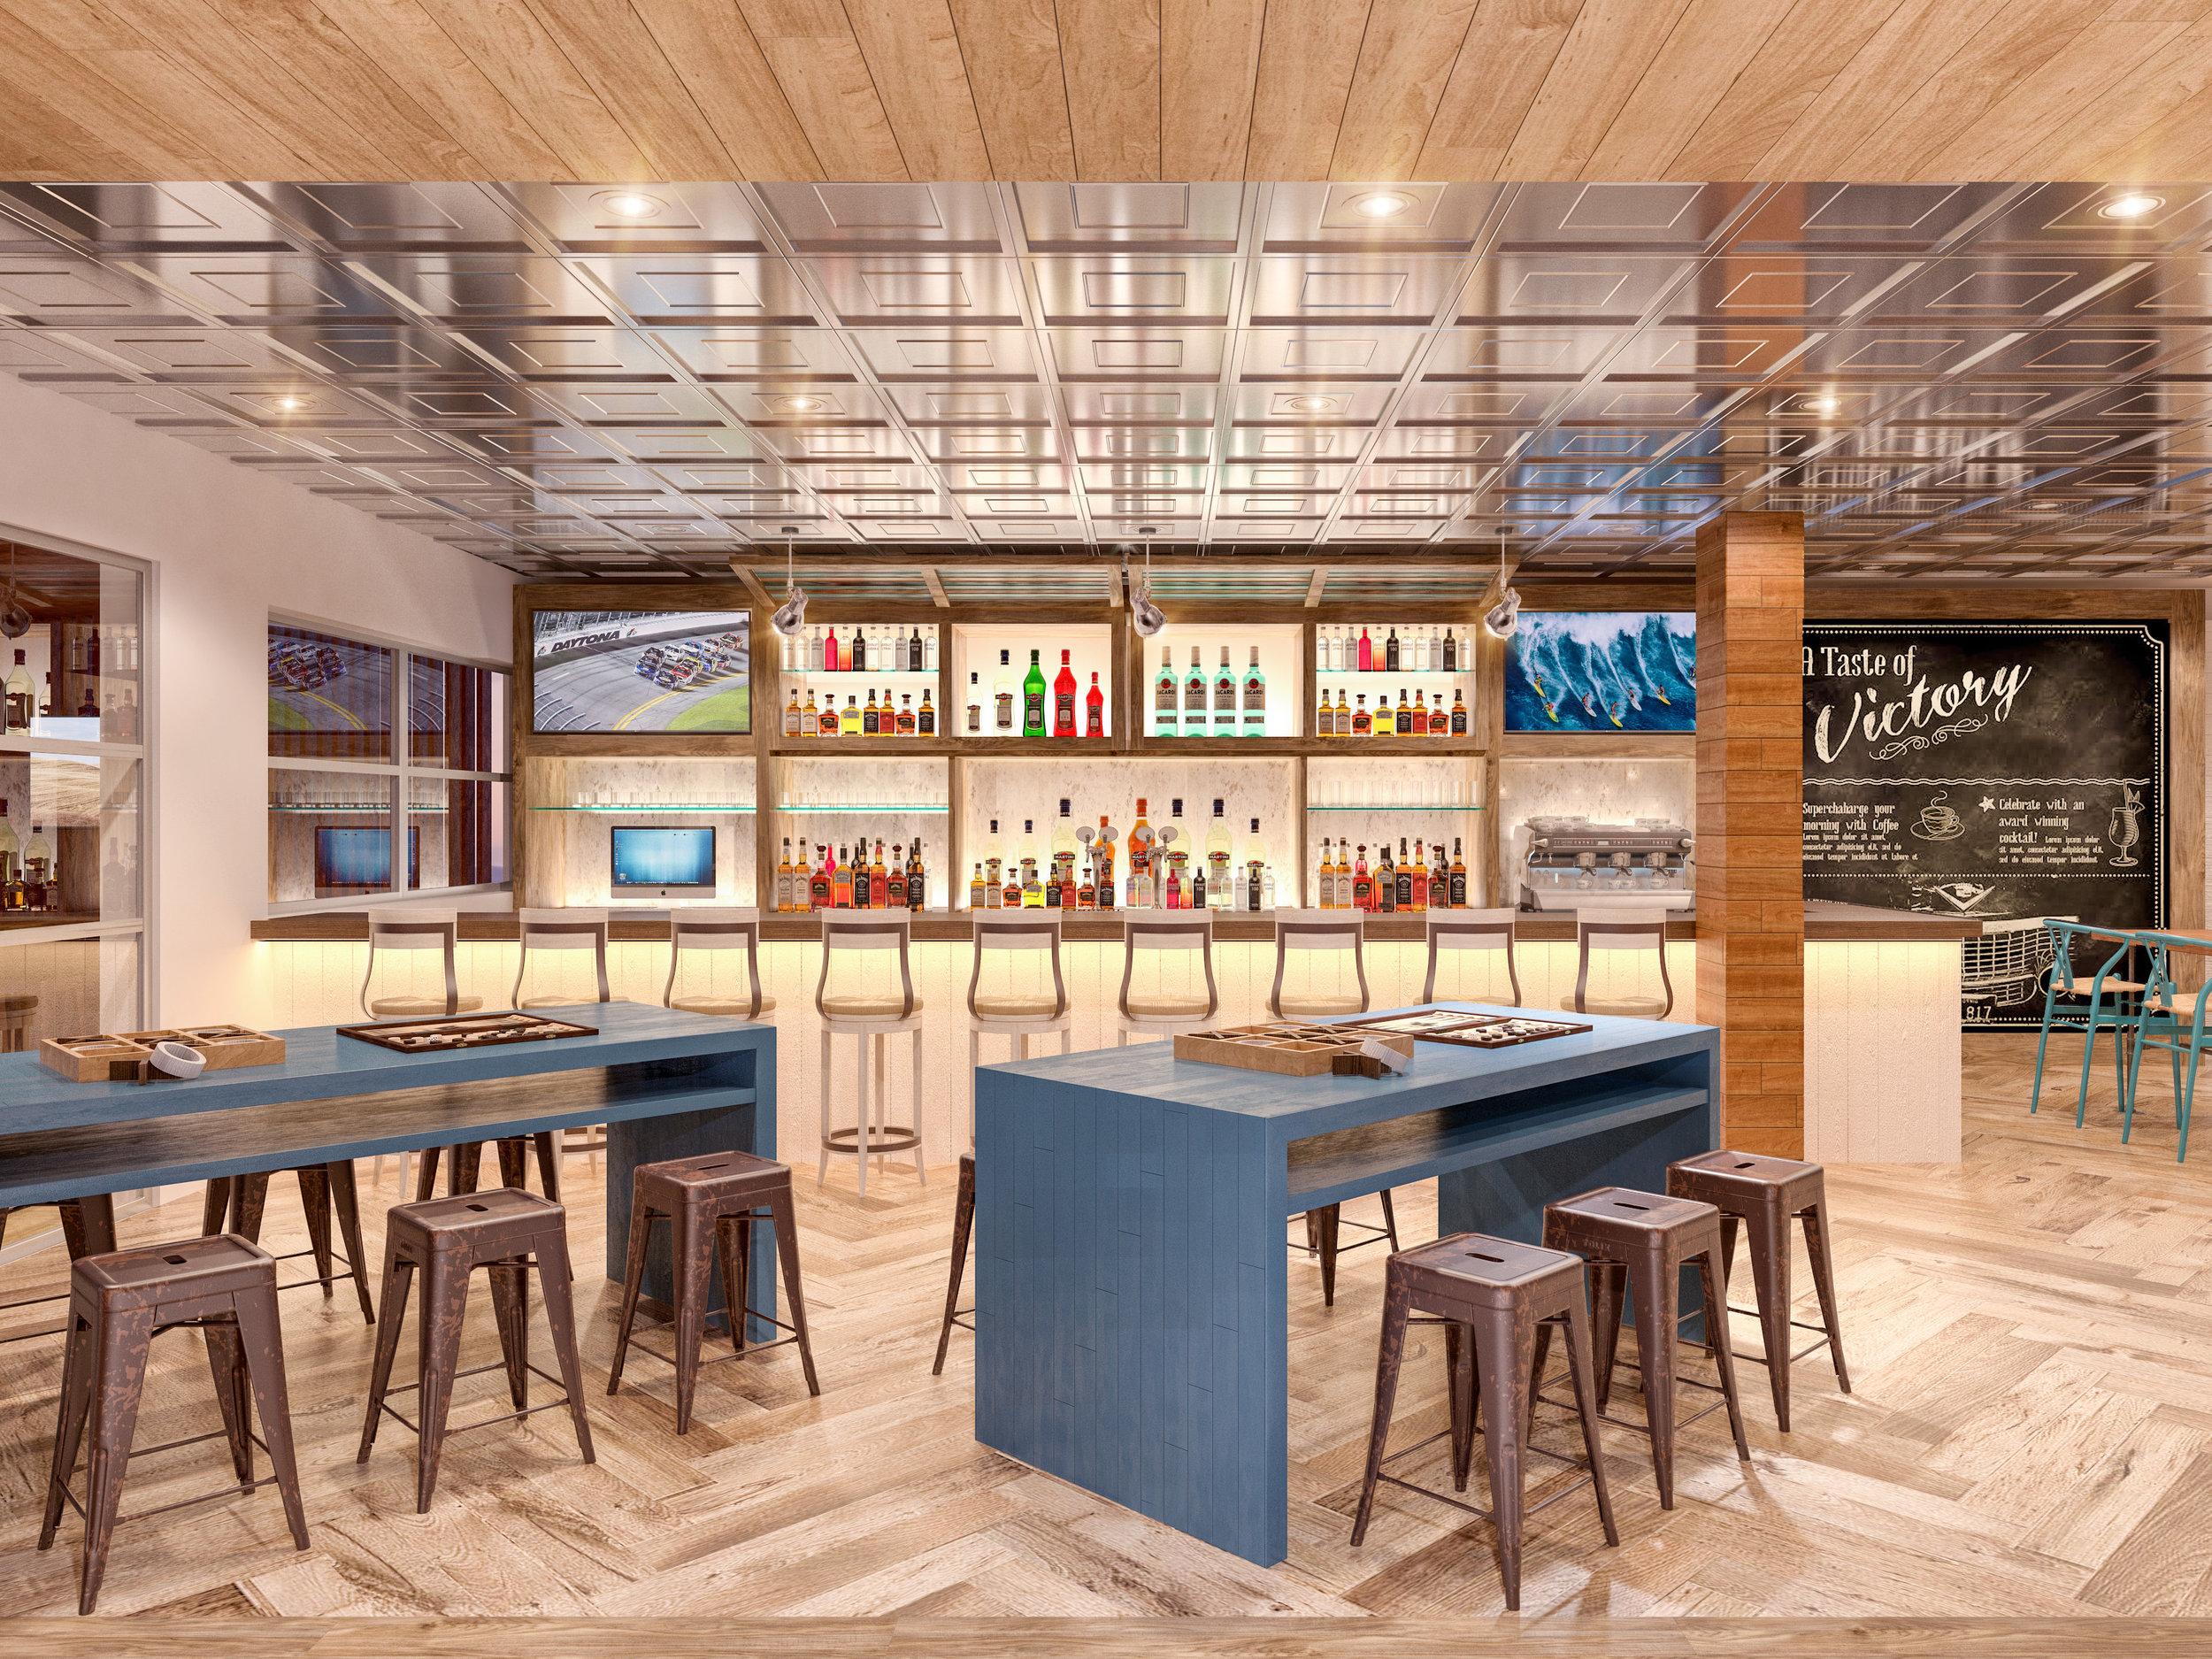 Night Bar Resturant at Delta Hotel Daytona Shores, in Daytona Beach, FL, Designed by Design Poole, Inc in Winter Park Florida